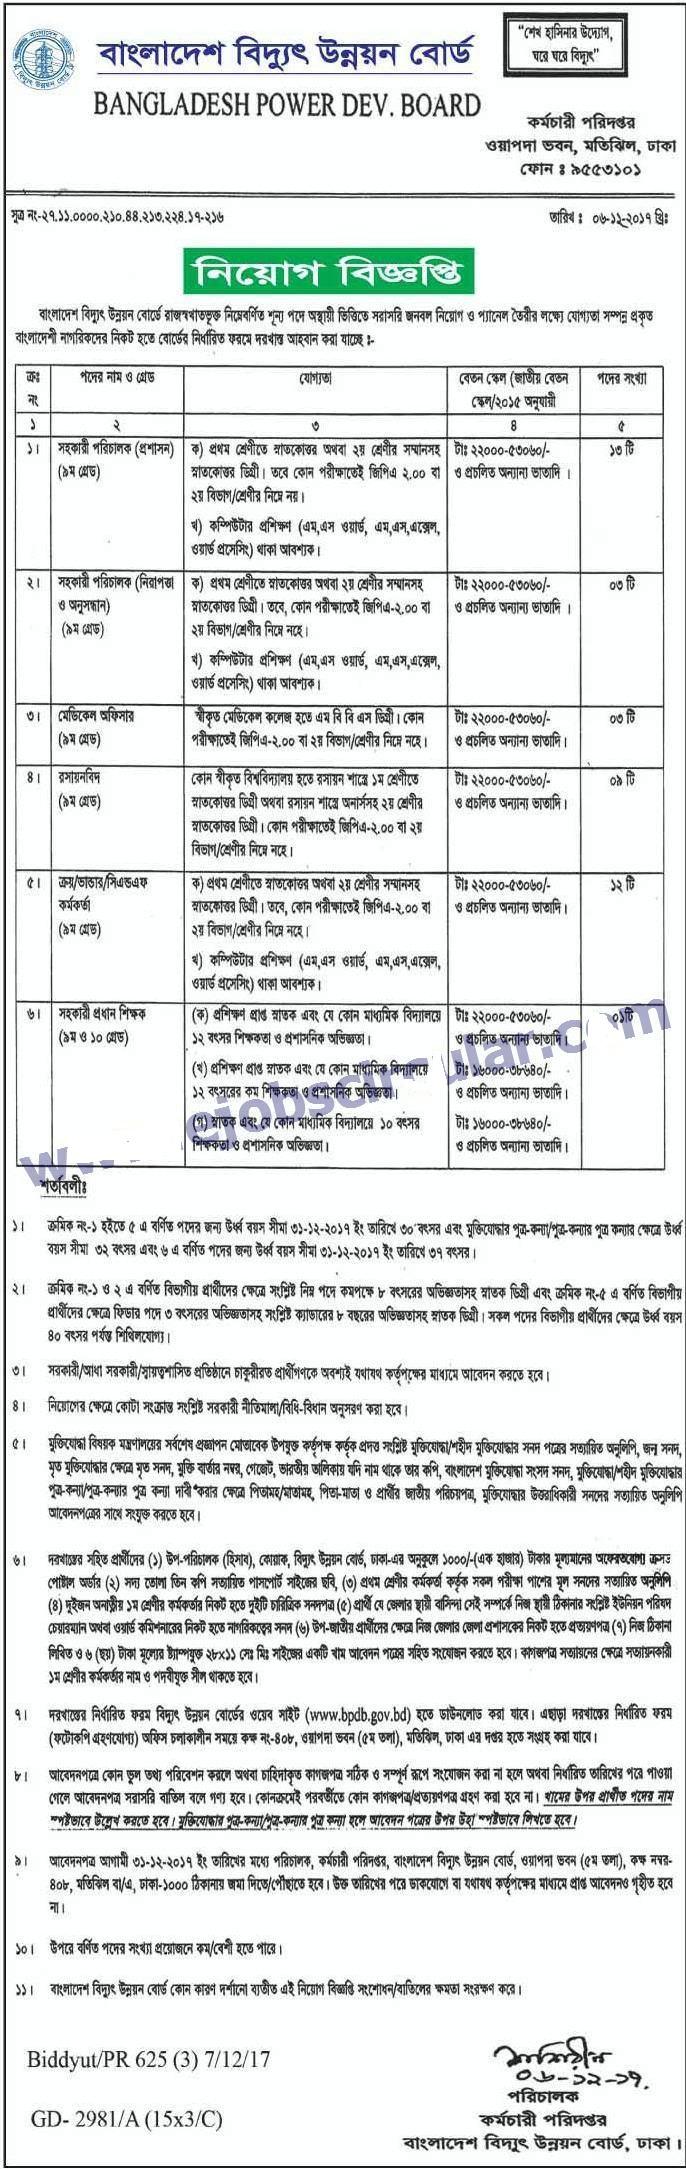 Bangladesh Power Development Board BPDB Job circular 2017